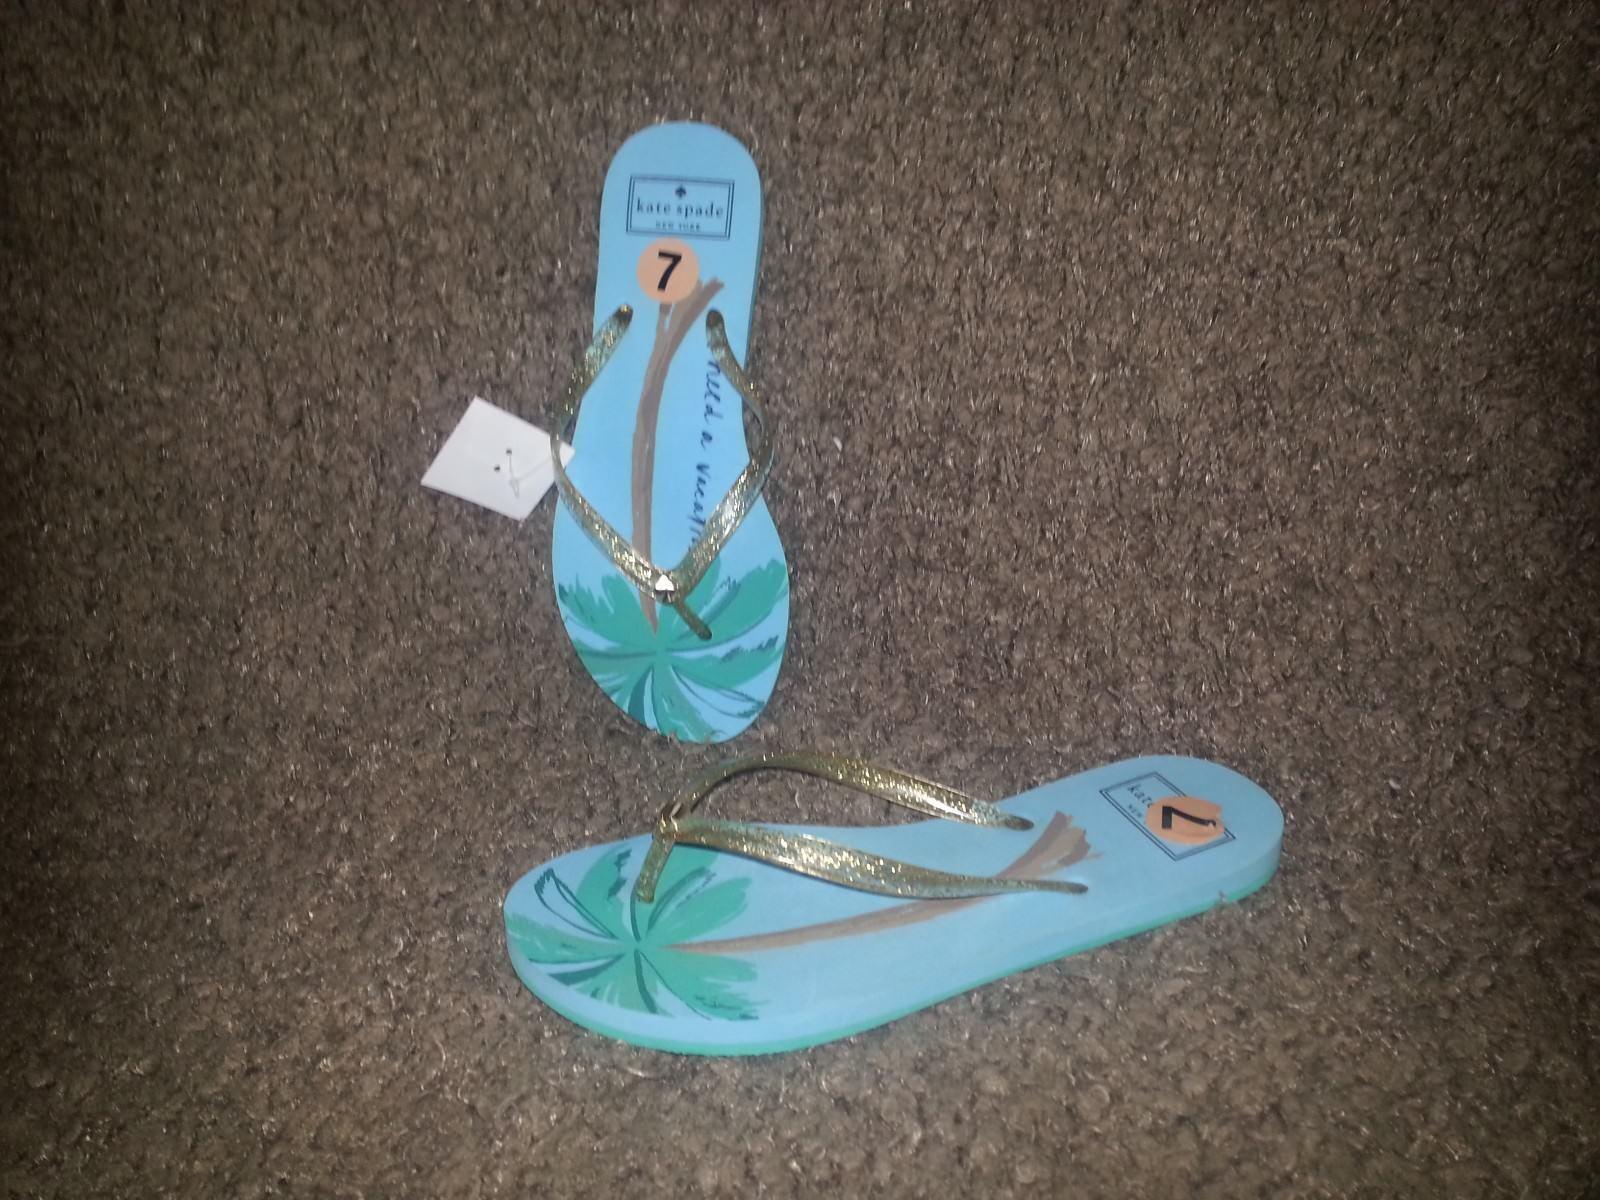 Steve Madden P-Bazle Women's 6 Brown Gray Suede Thong Sandals Sz 6 Women's 7917 63ed93